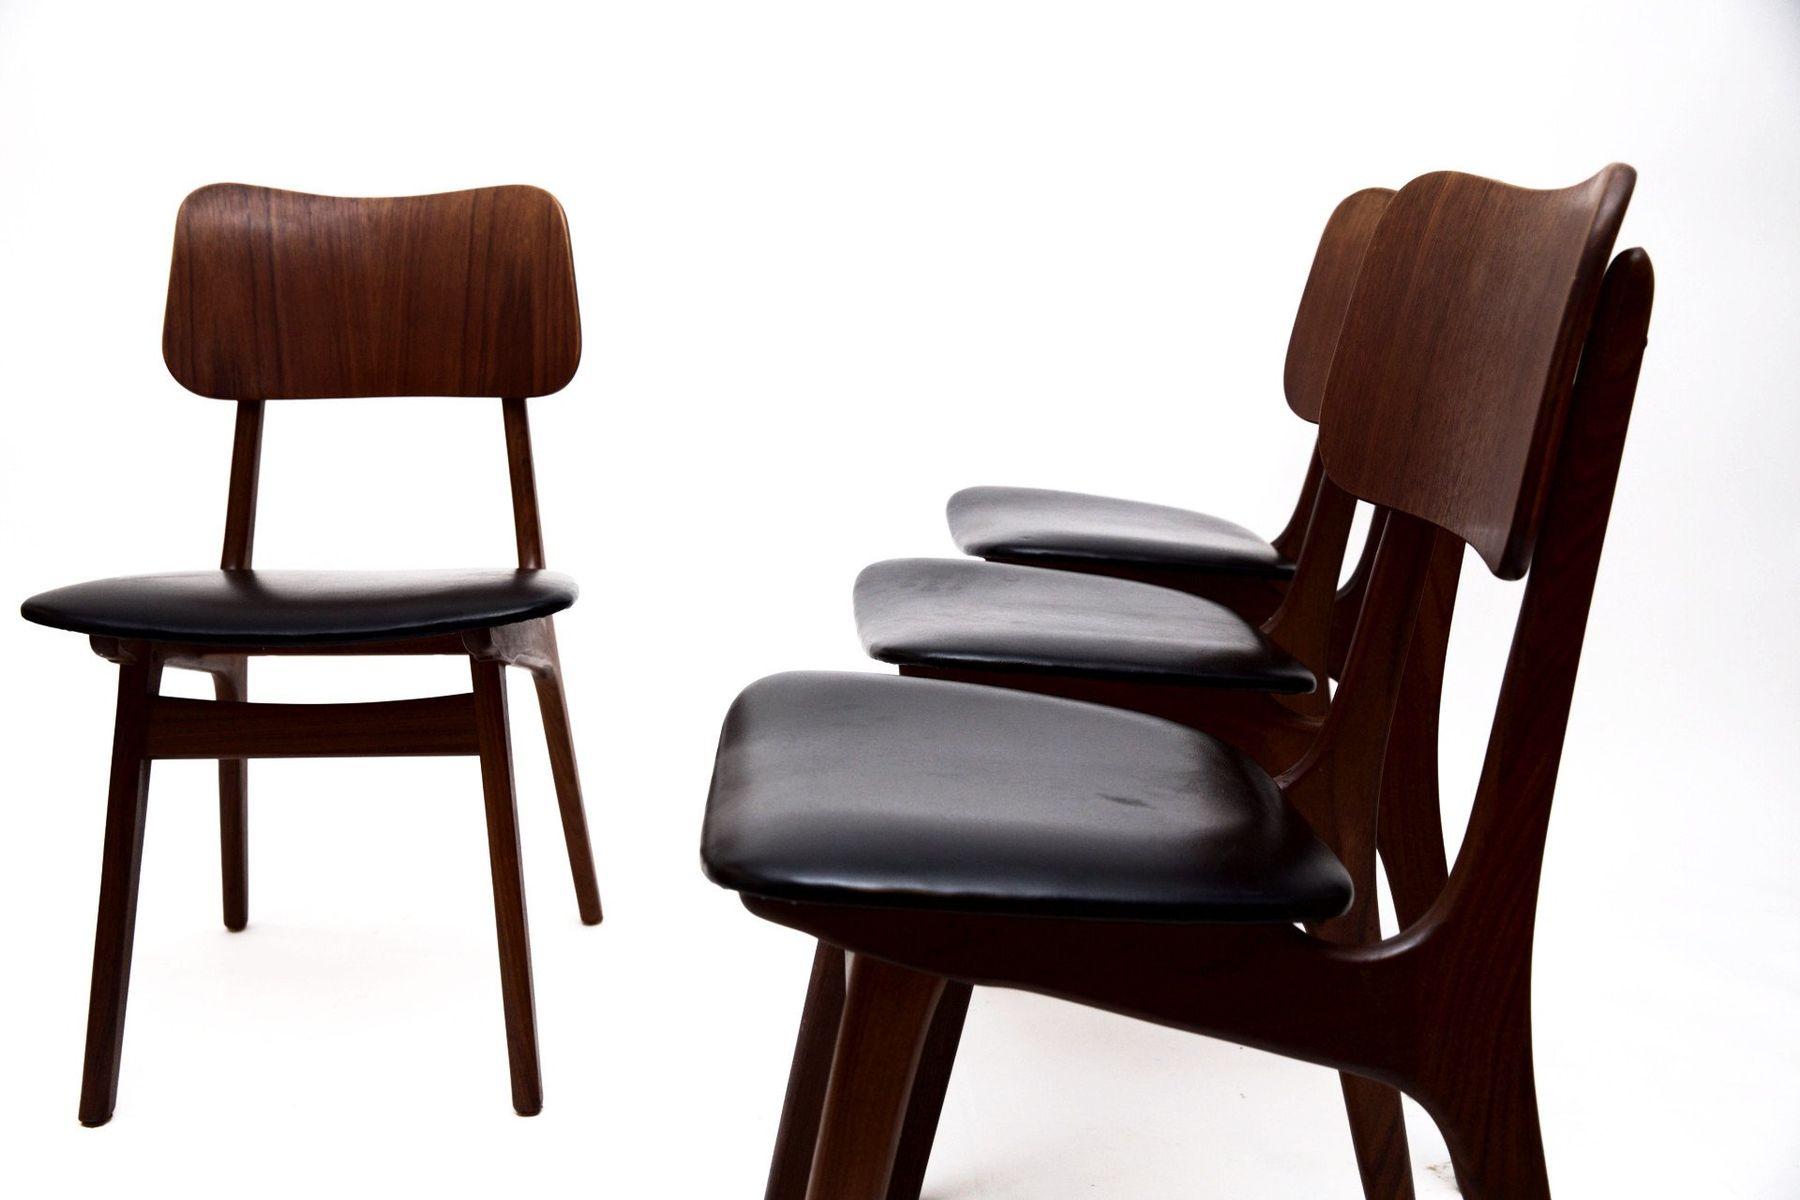 Teak Dining Chairs by Ib Kofod Larsen for Christensen and Larsen